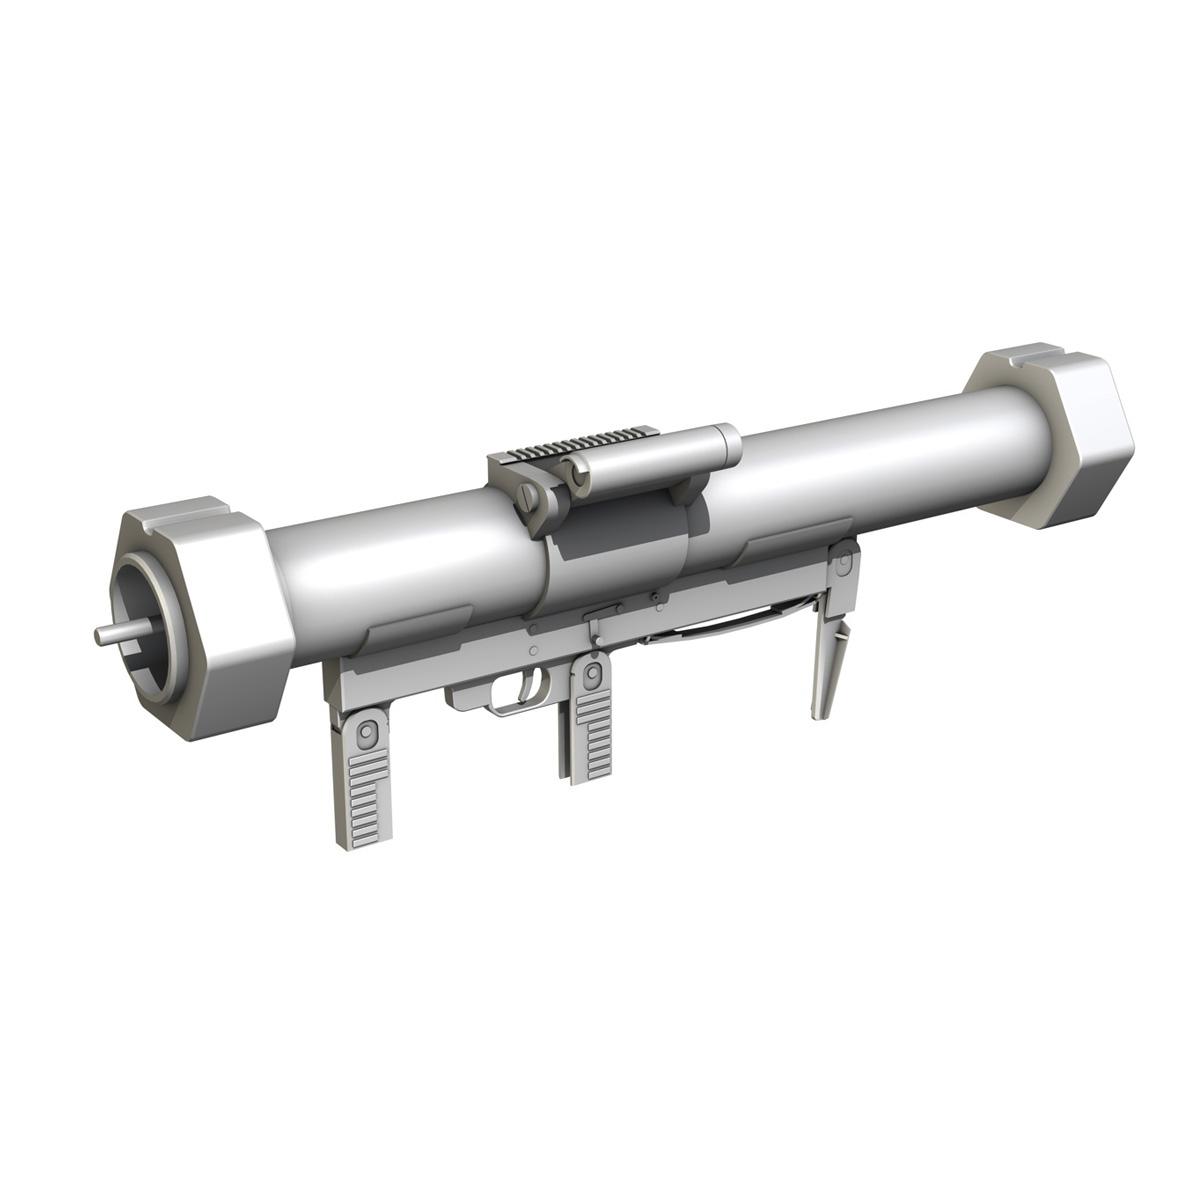 эсрэг хуяг Launcher Matador 3d загвар 3ds fbx c4d lwo obj 197076